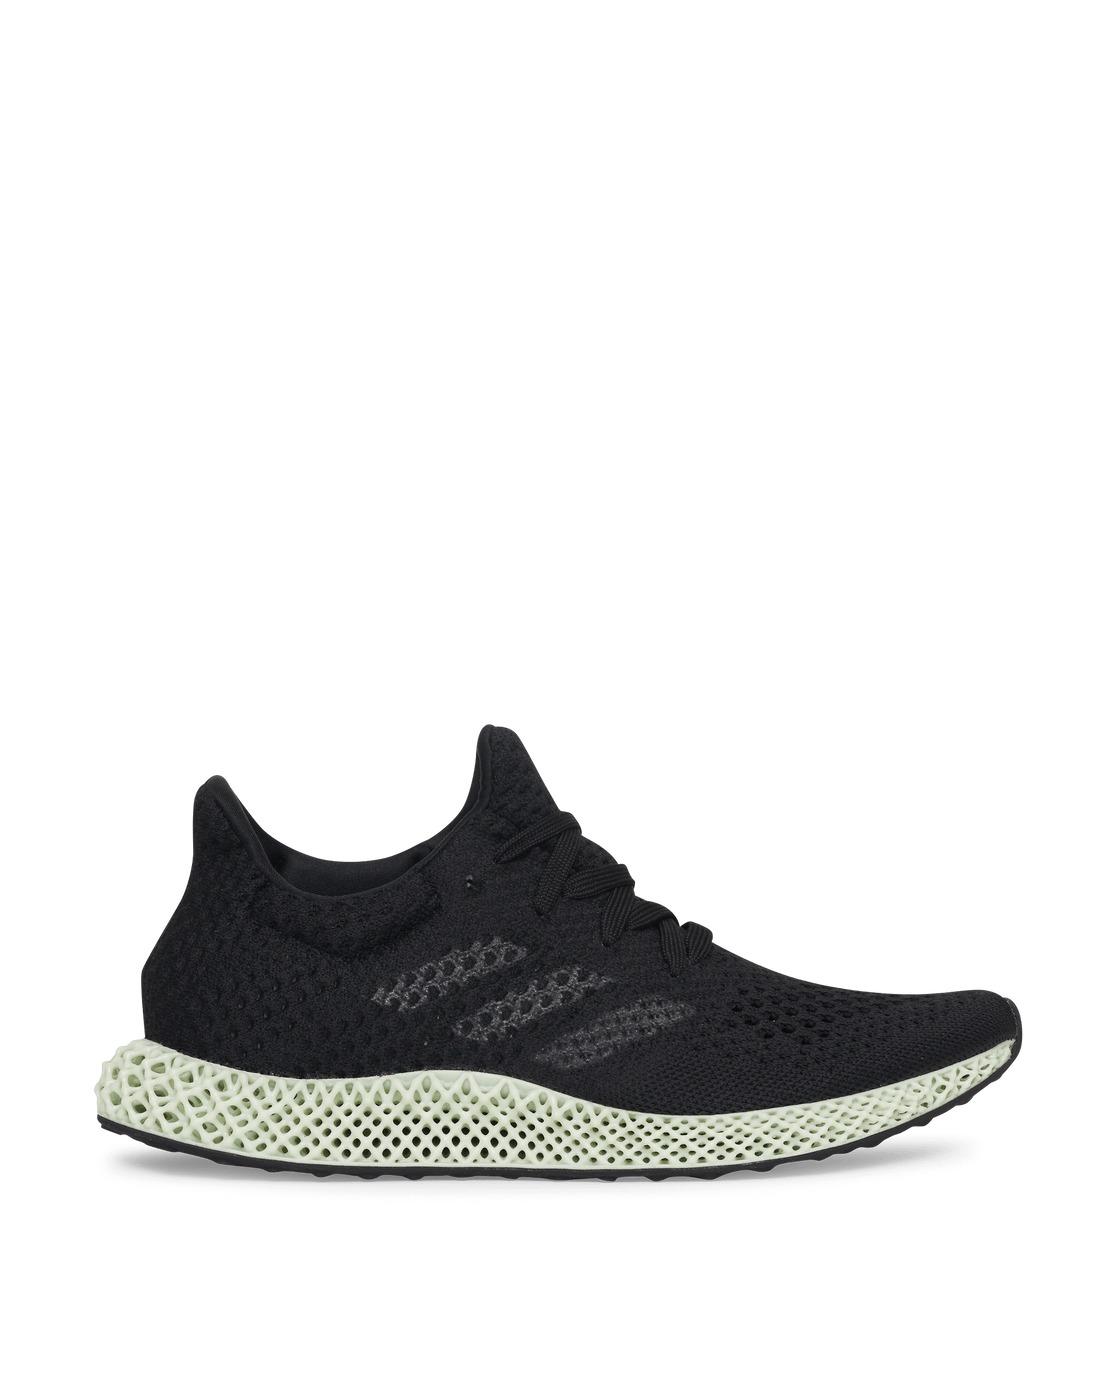 Adidas Originals 4d Futurecraft Sneakers Core Black/Grey Five